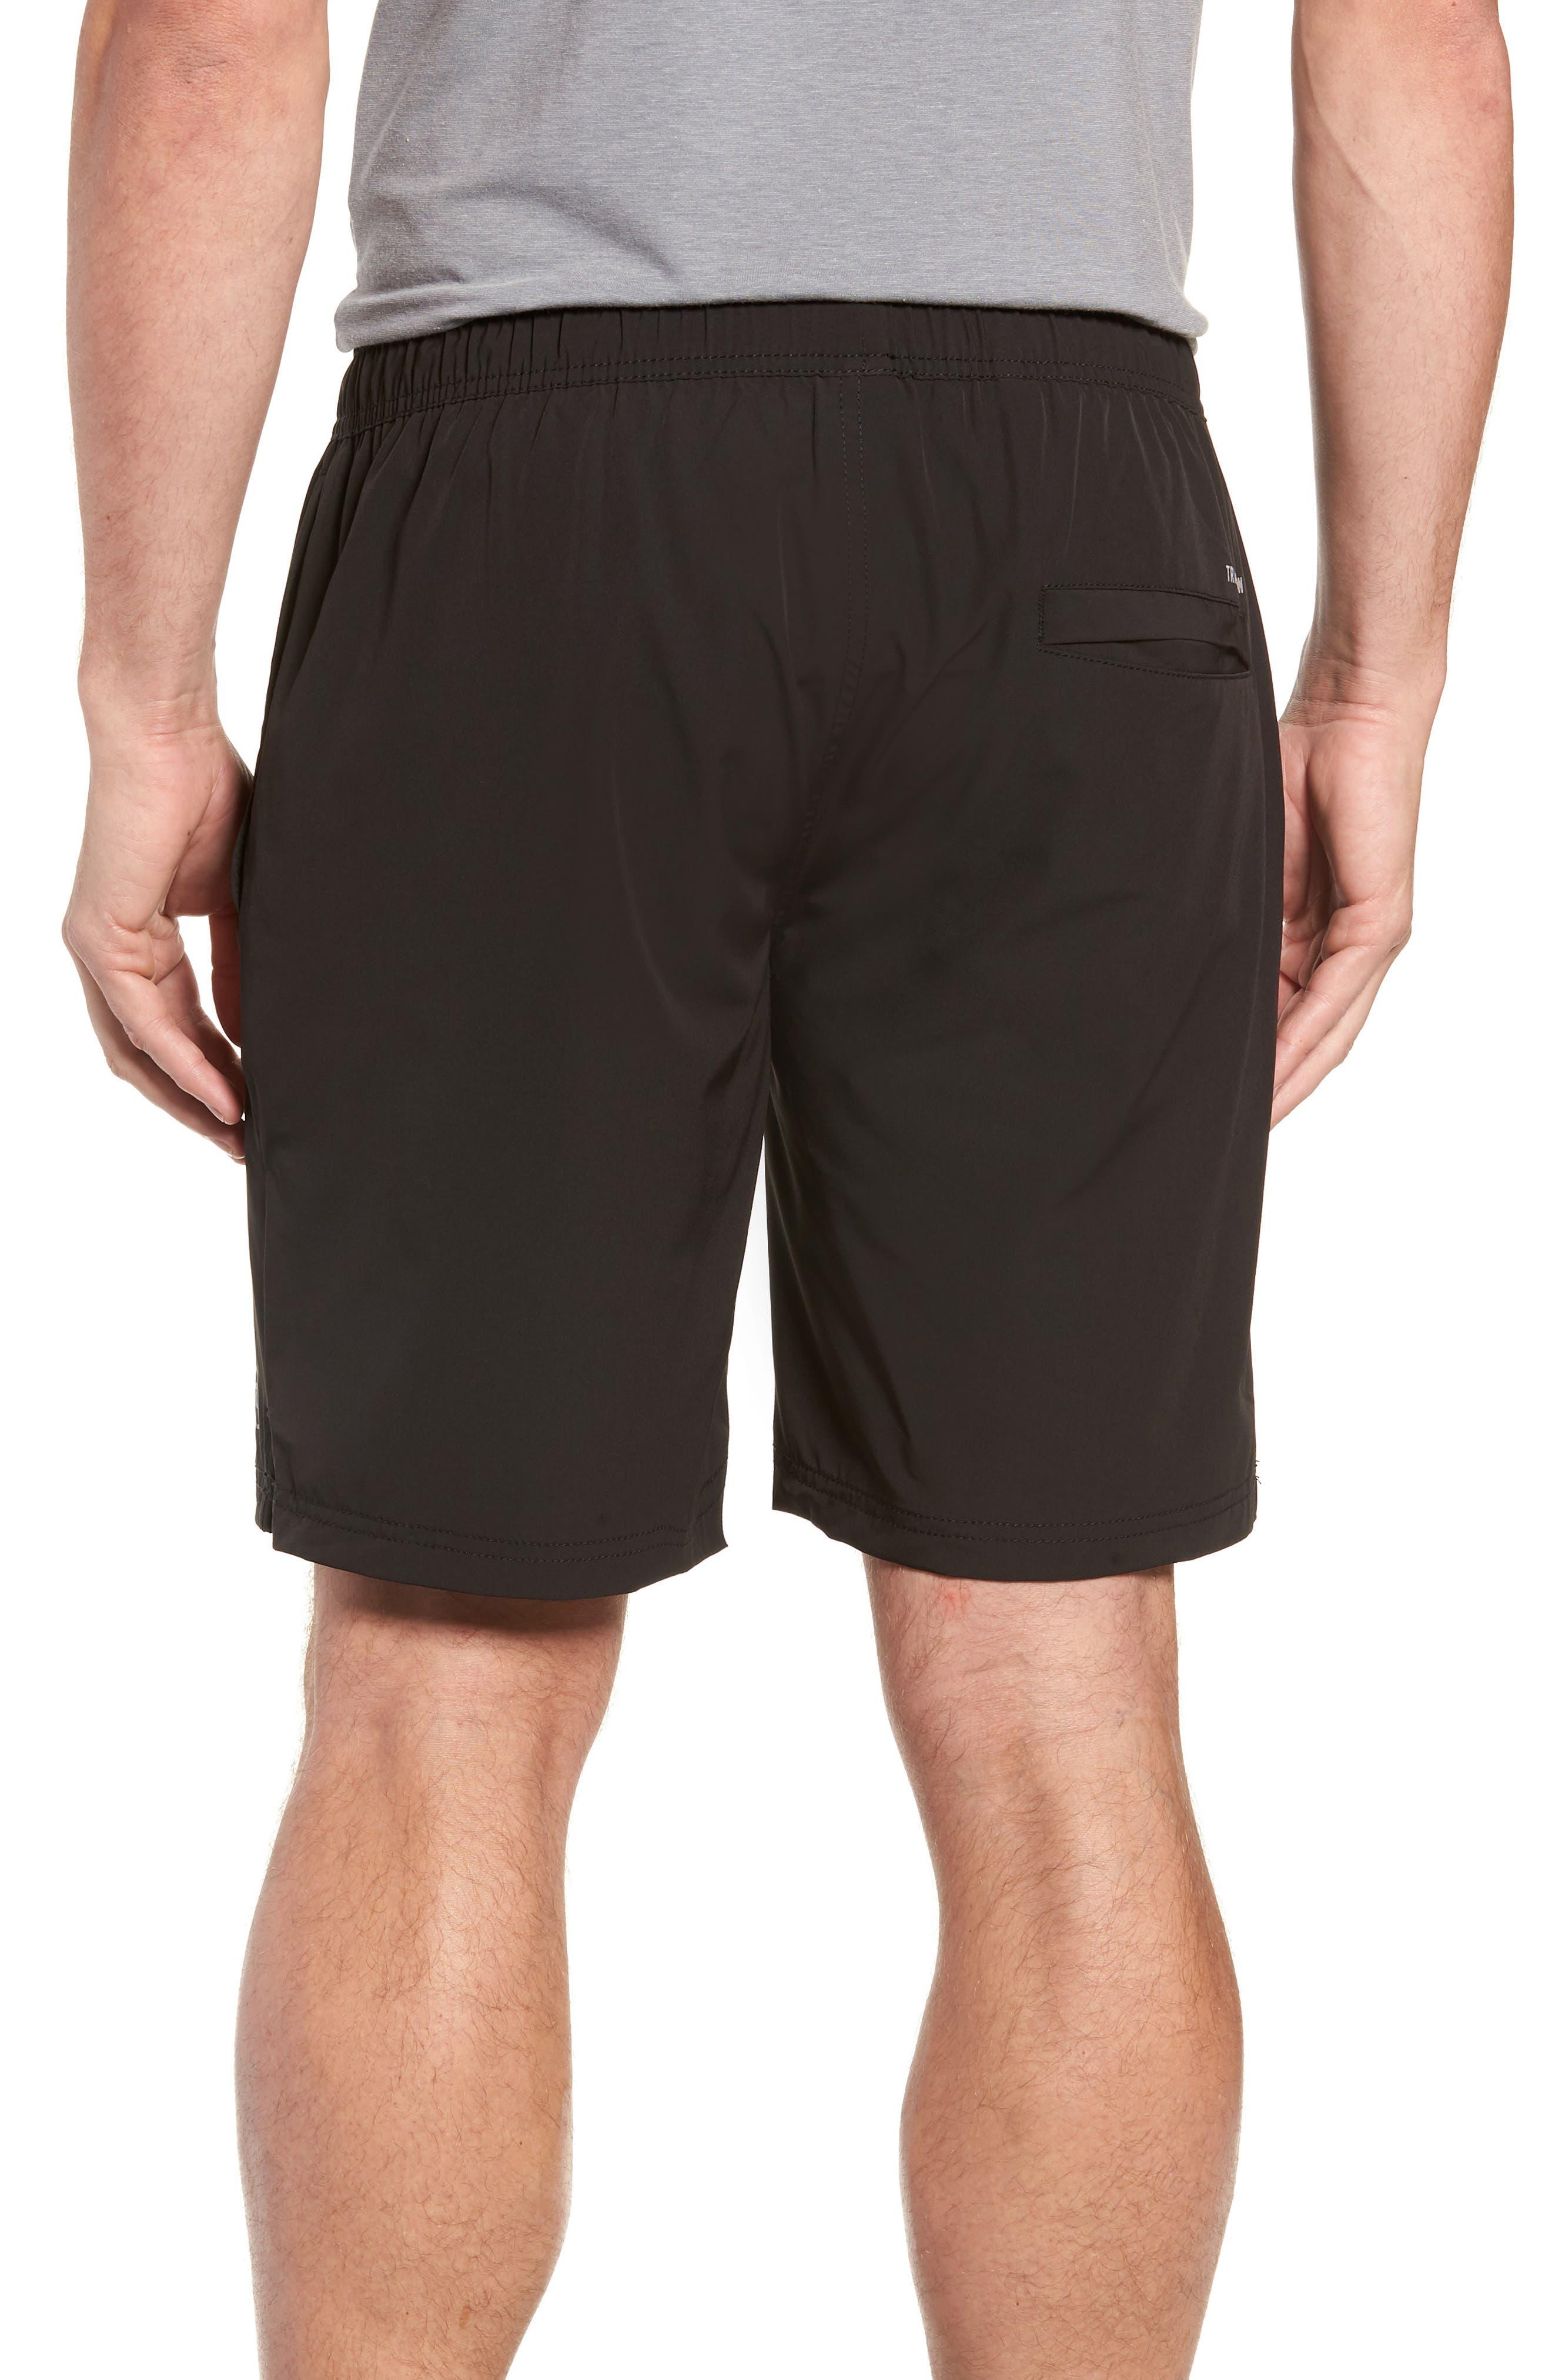 Deering Shorts,                             Alternate thumbnail 2, color,                             BLACK